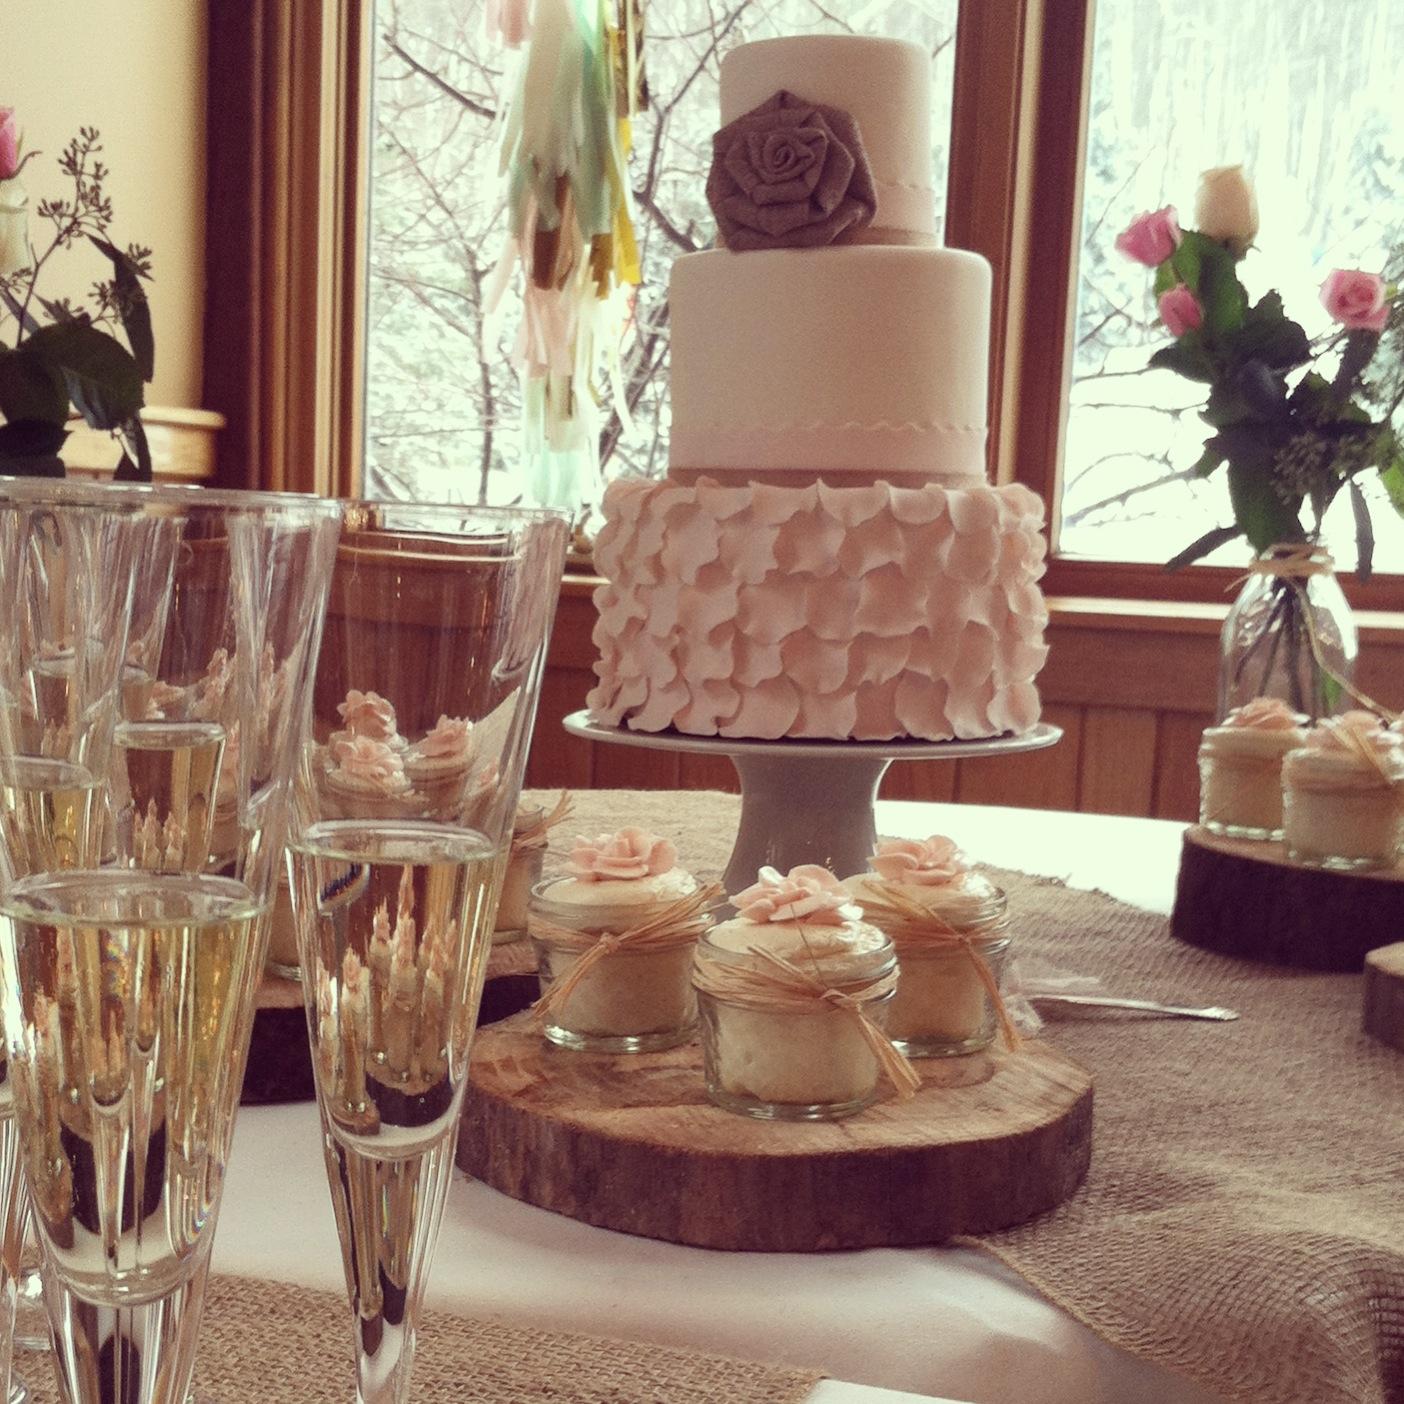 Rustic Wedding Cupcake Ideas: Lola Pearl Bake Shoppe: Rustic Elegance Wedding Cake